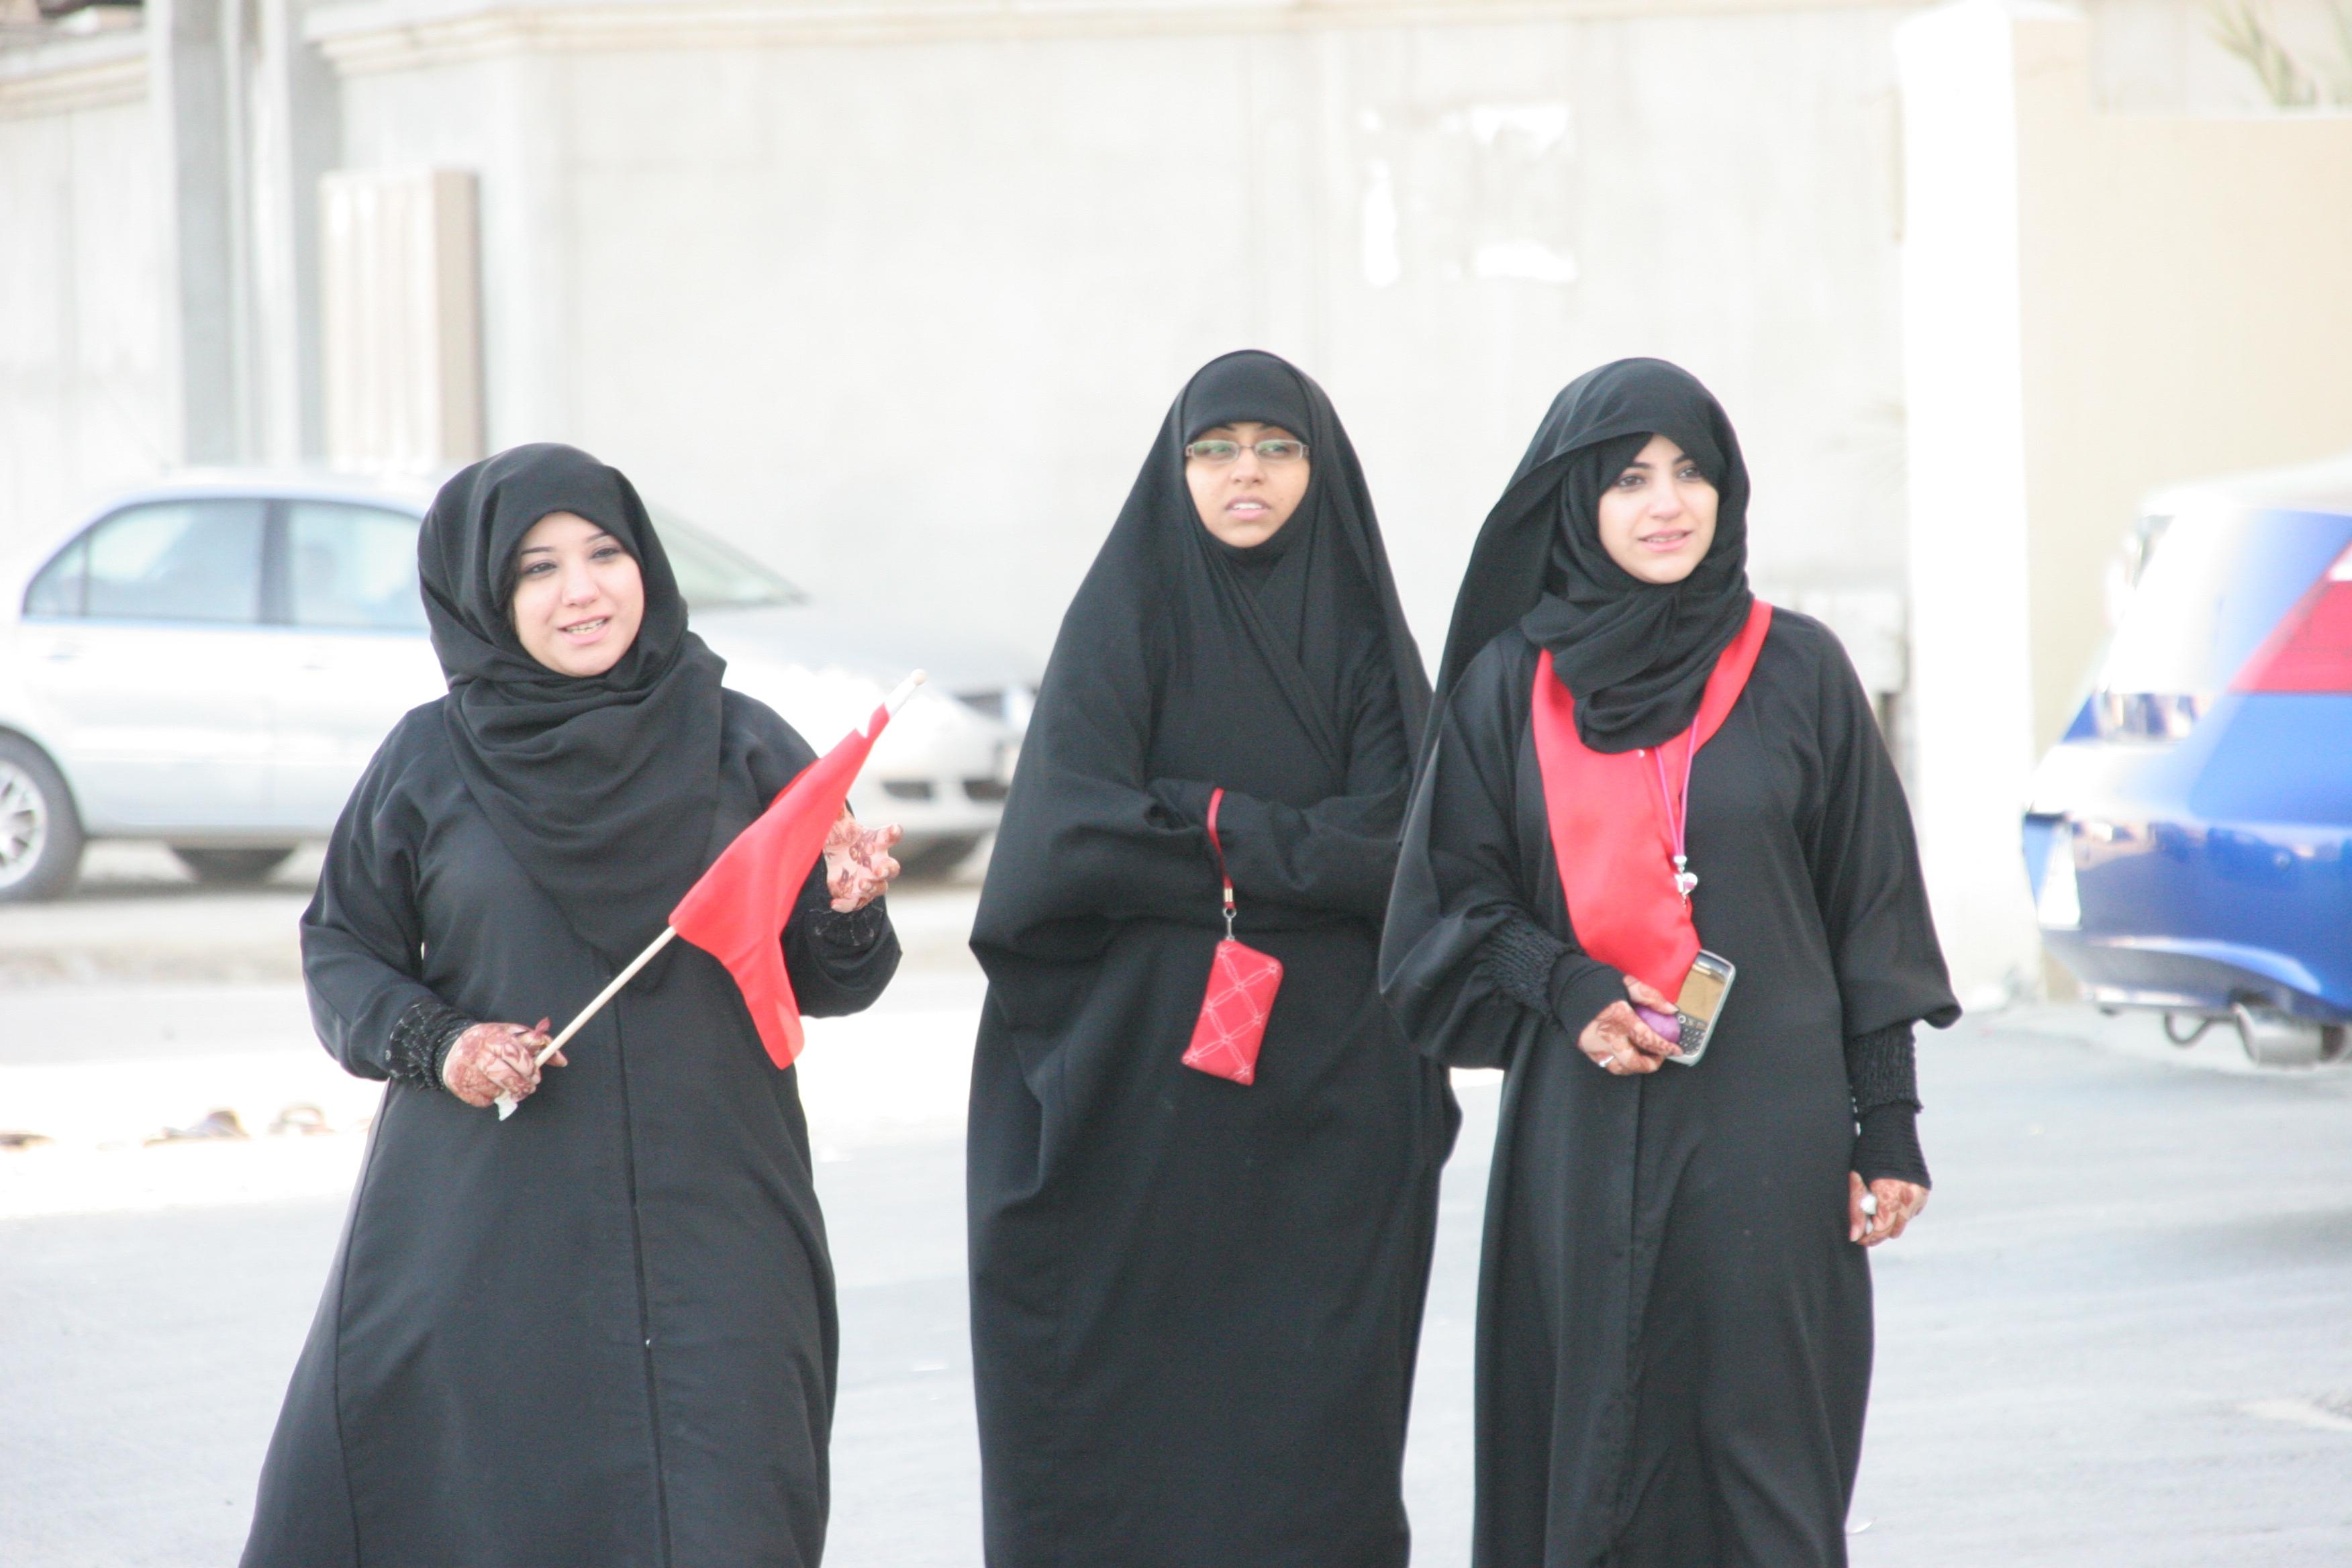 hijab wiki everipedia